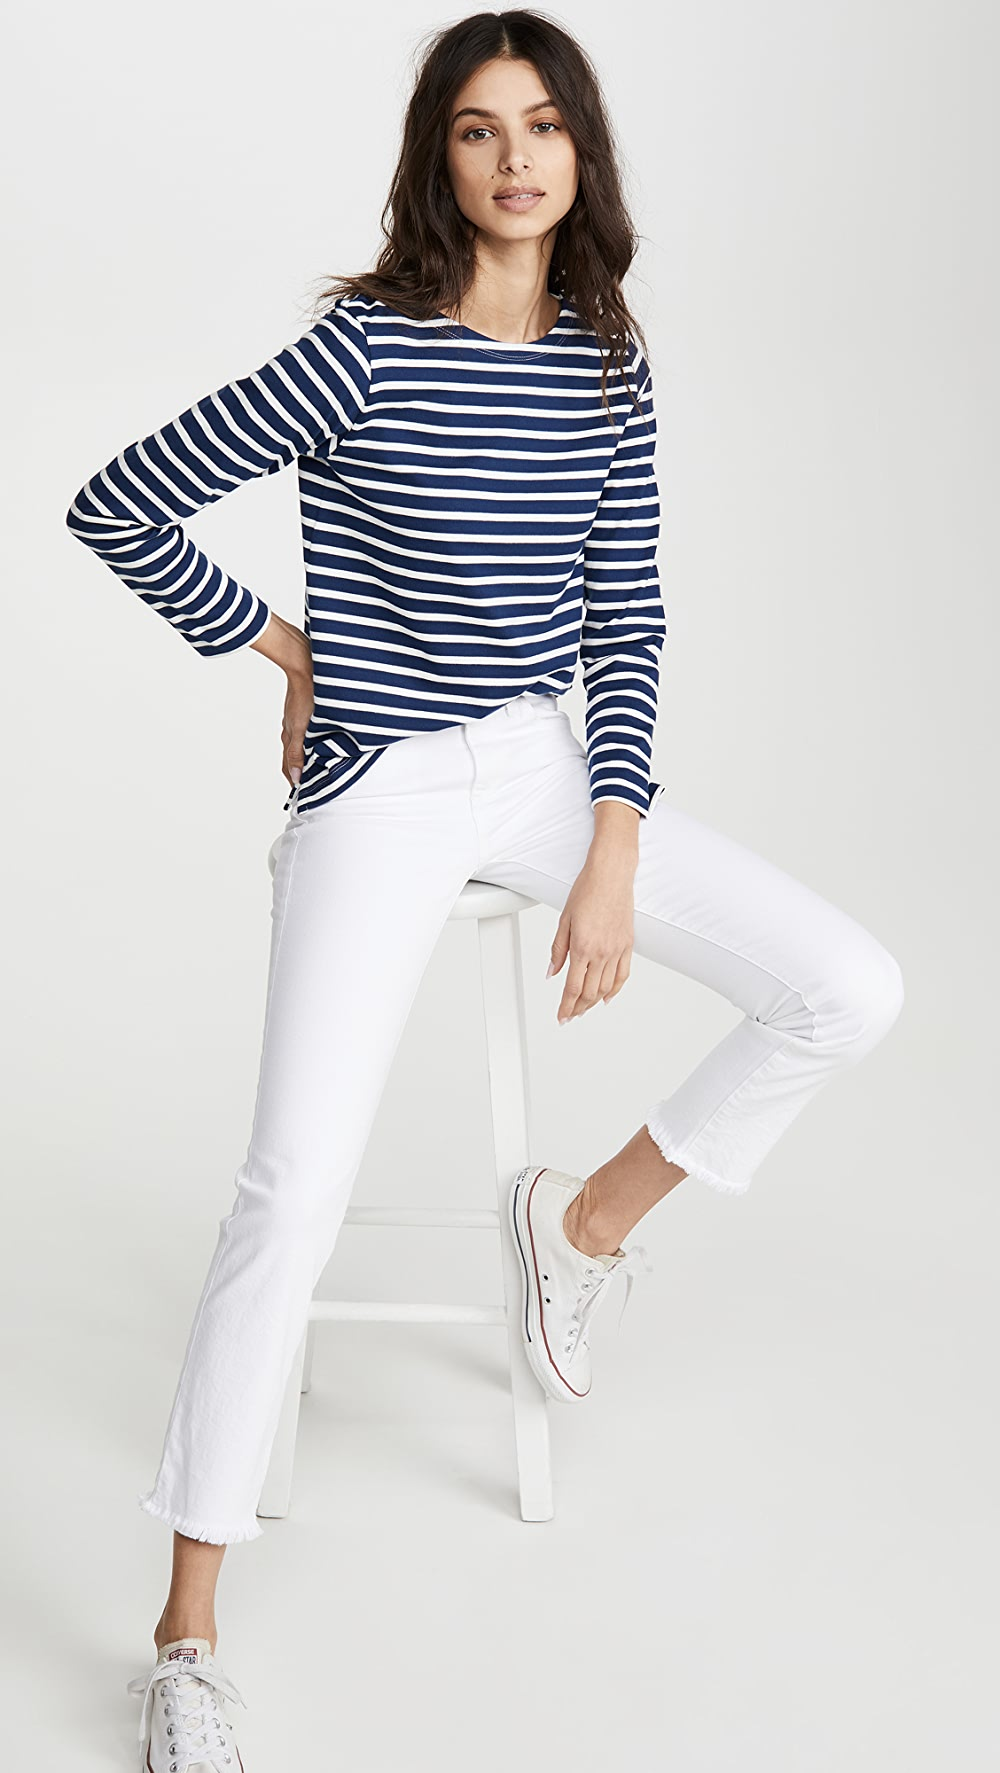 Charitable Joe's Jeans - The Lara Cigarette Ankle Jeans Diversified Latest Designs